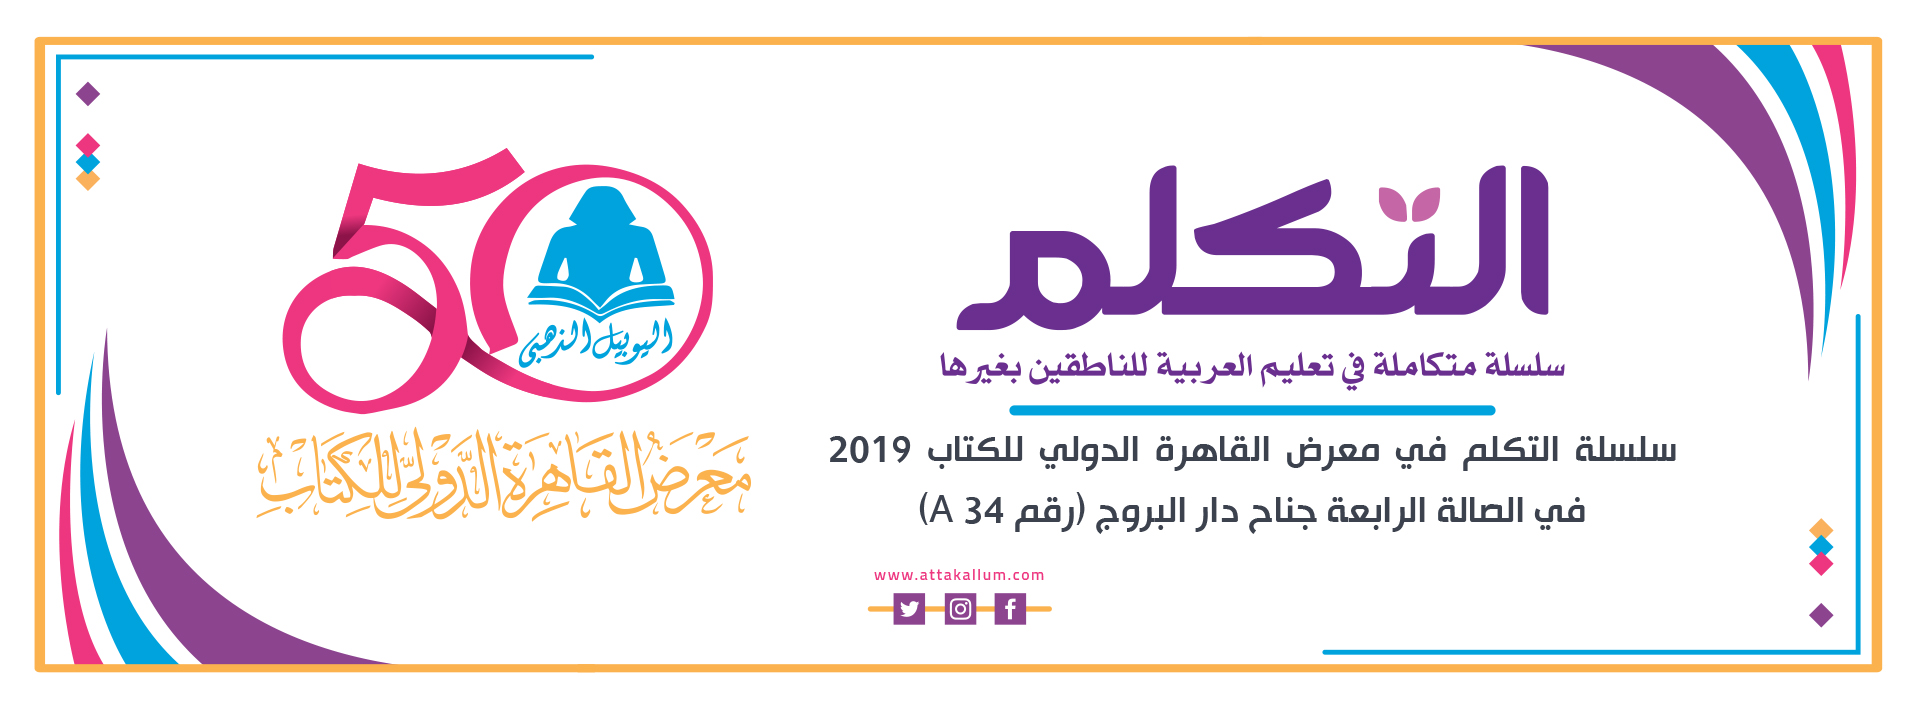 cairo international book fair 2019